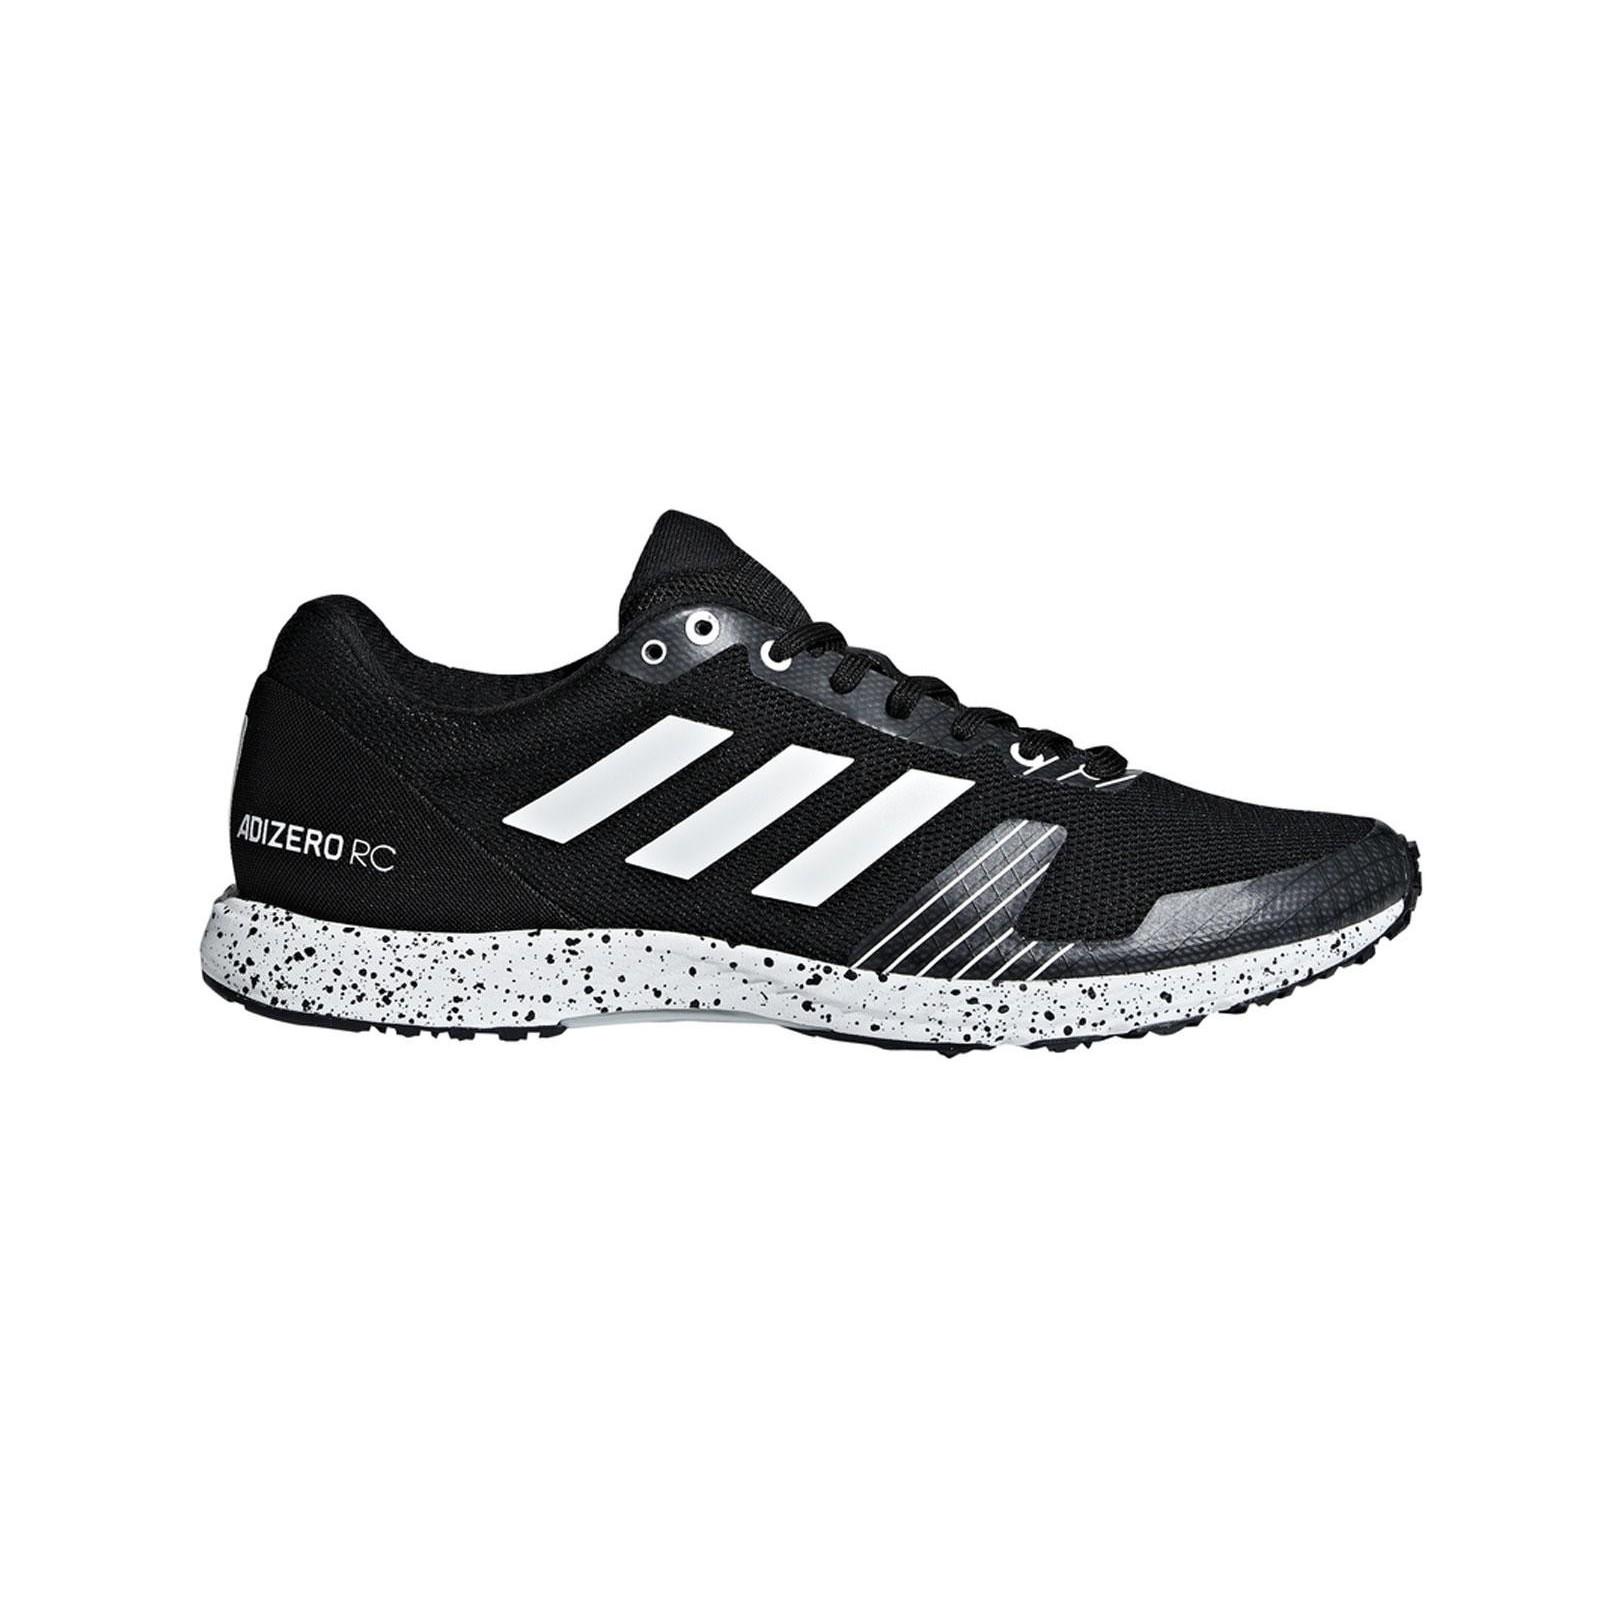 ADIZERO Adidas ADIZERO RCADIB37391 Adidas ADIZERO RCADIB37391 Adidas RCADIB37391 ADIZERO Adidas RCADIB37391 e9IWDYEH2